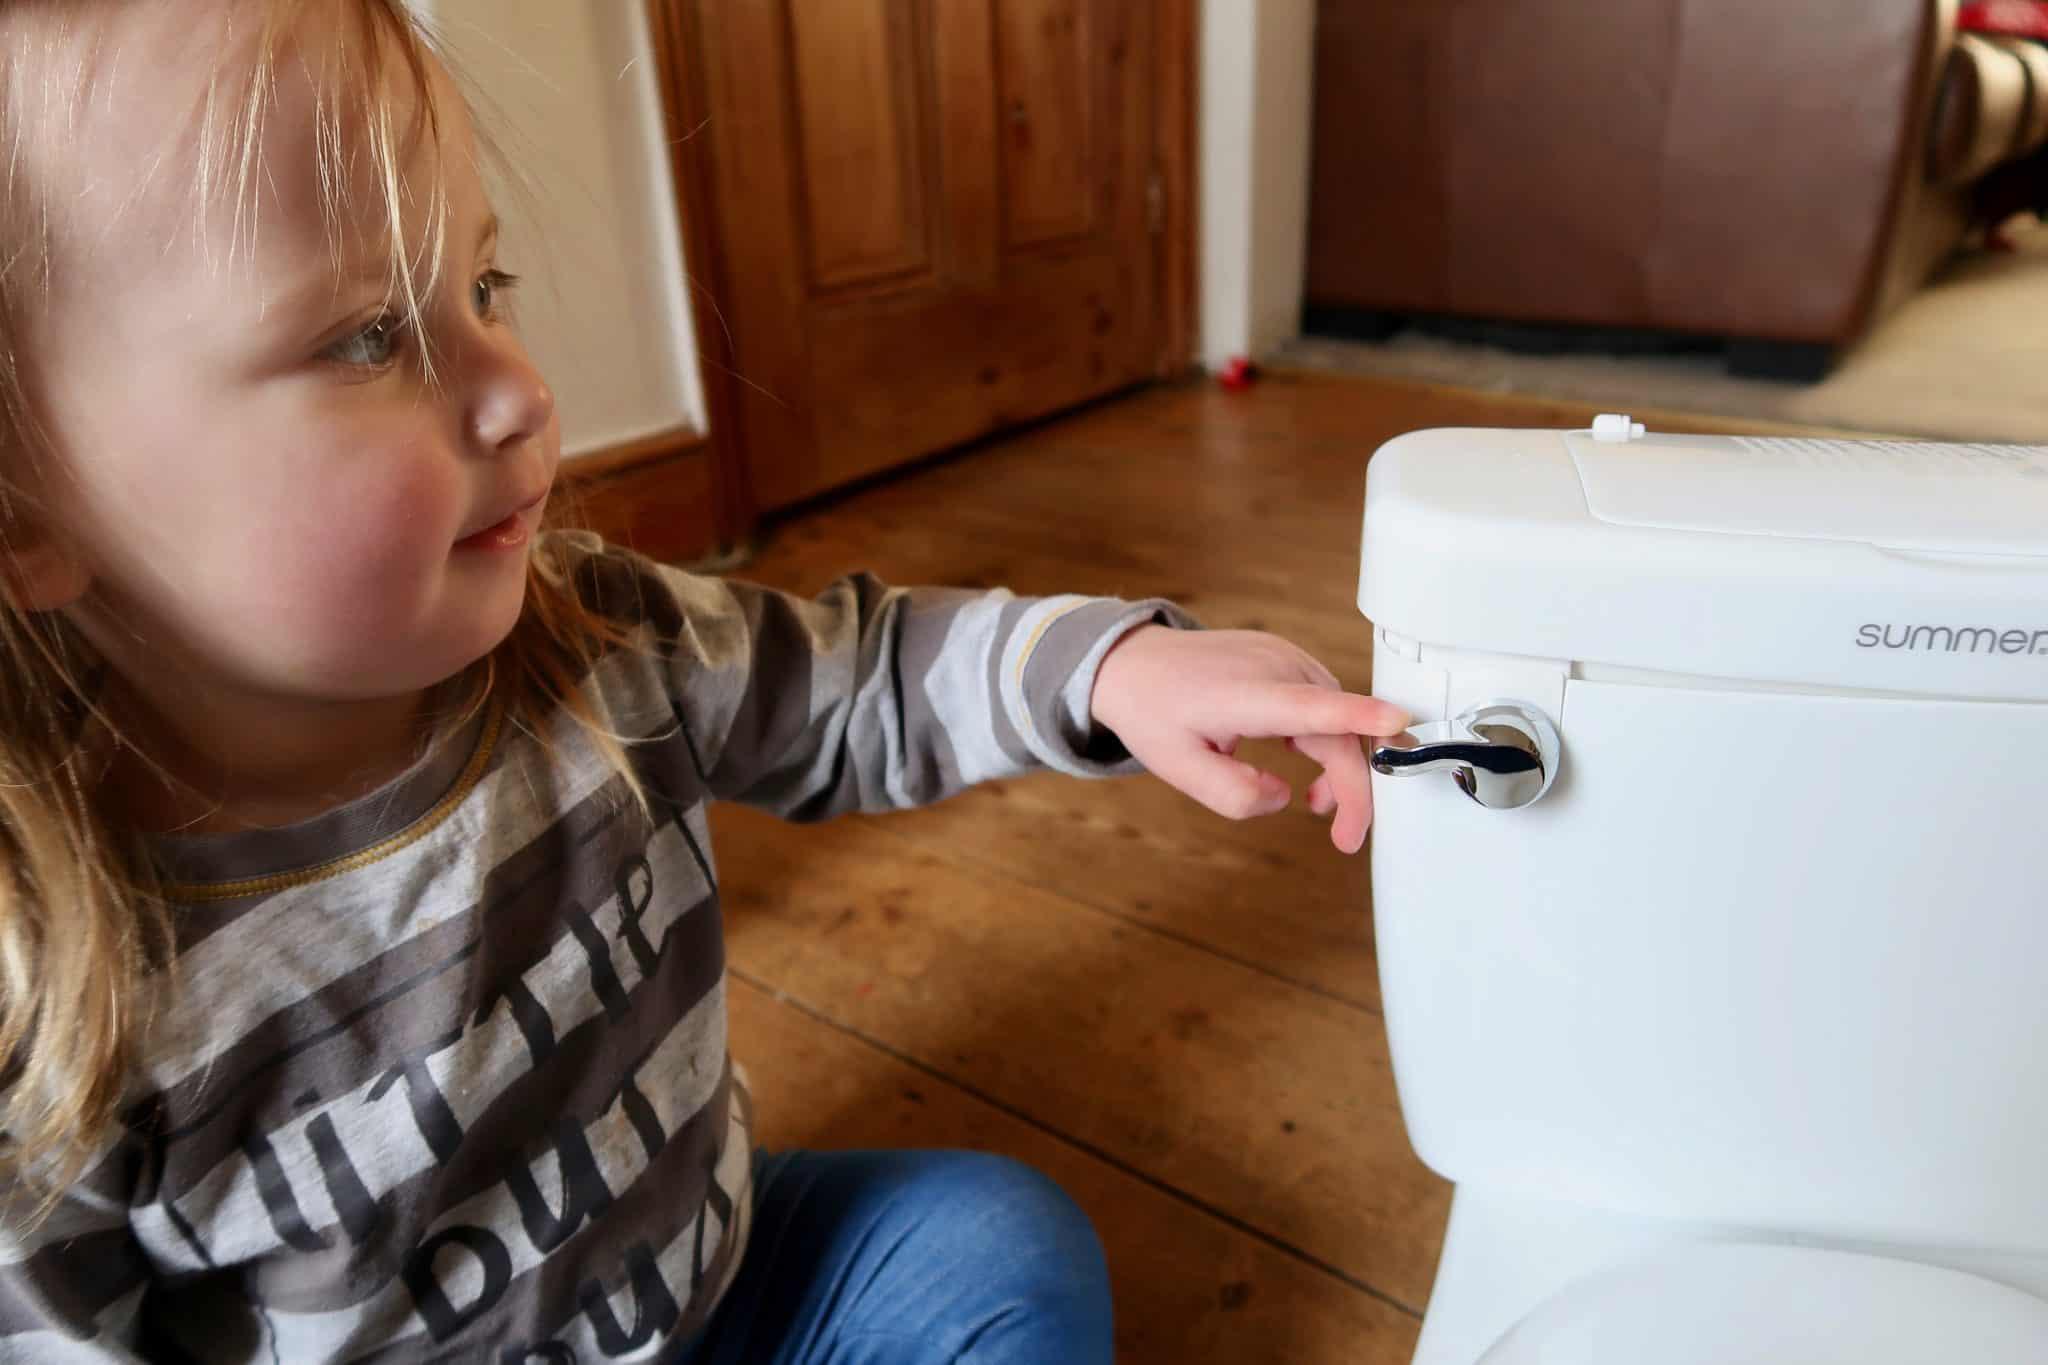 Preparing For Toilet Training